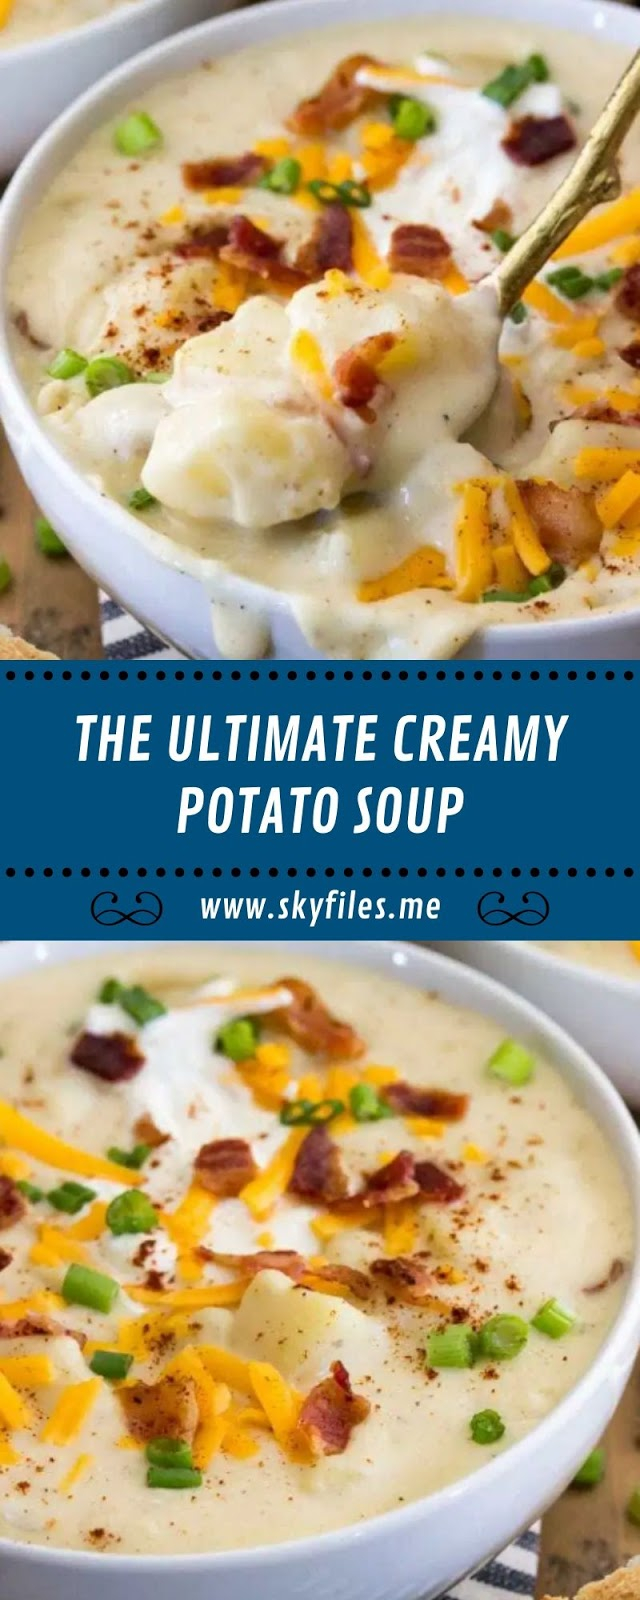 THE ULTIMATE CREAMY POTATO SOUP